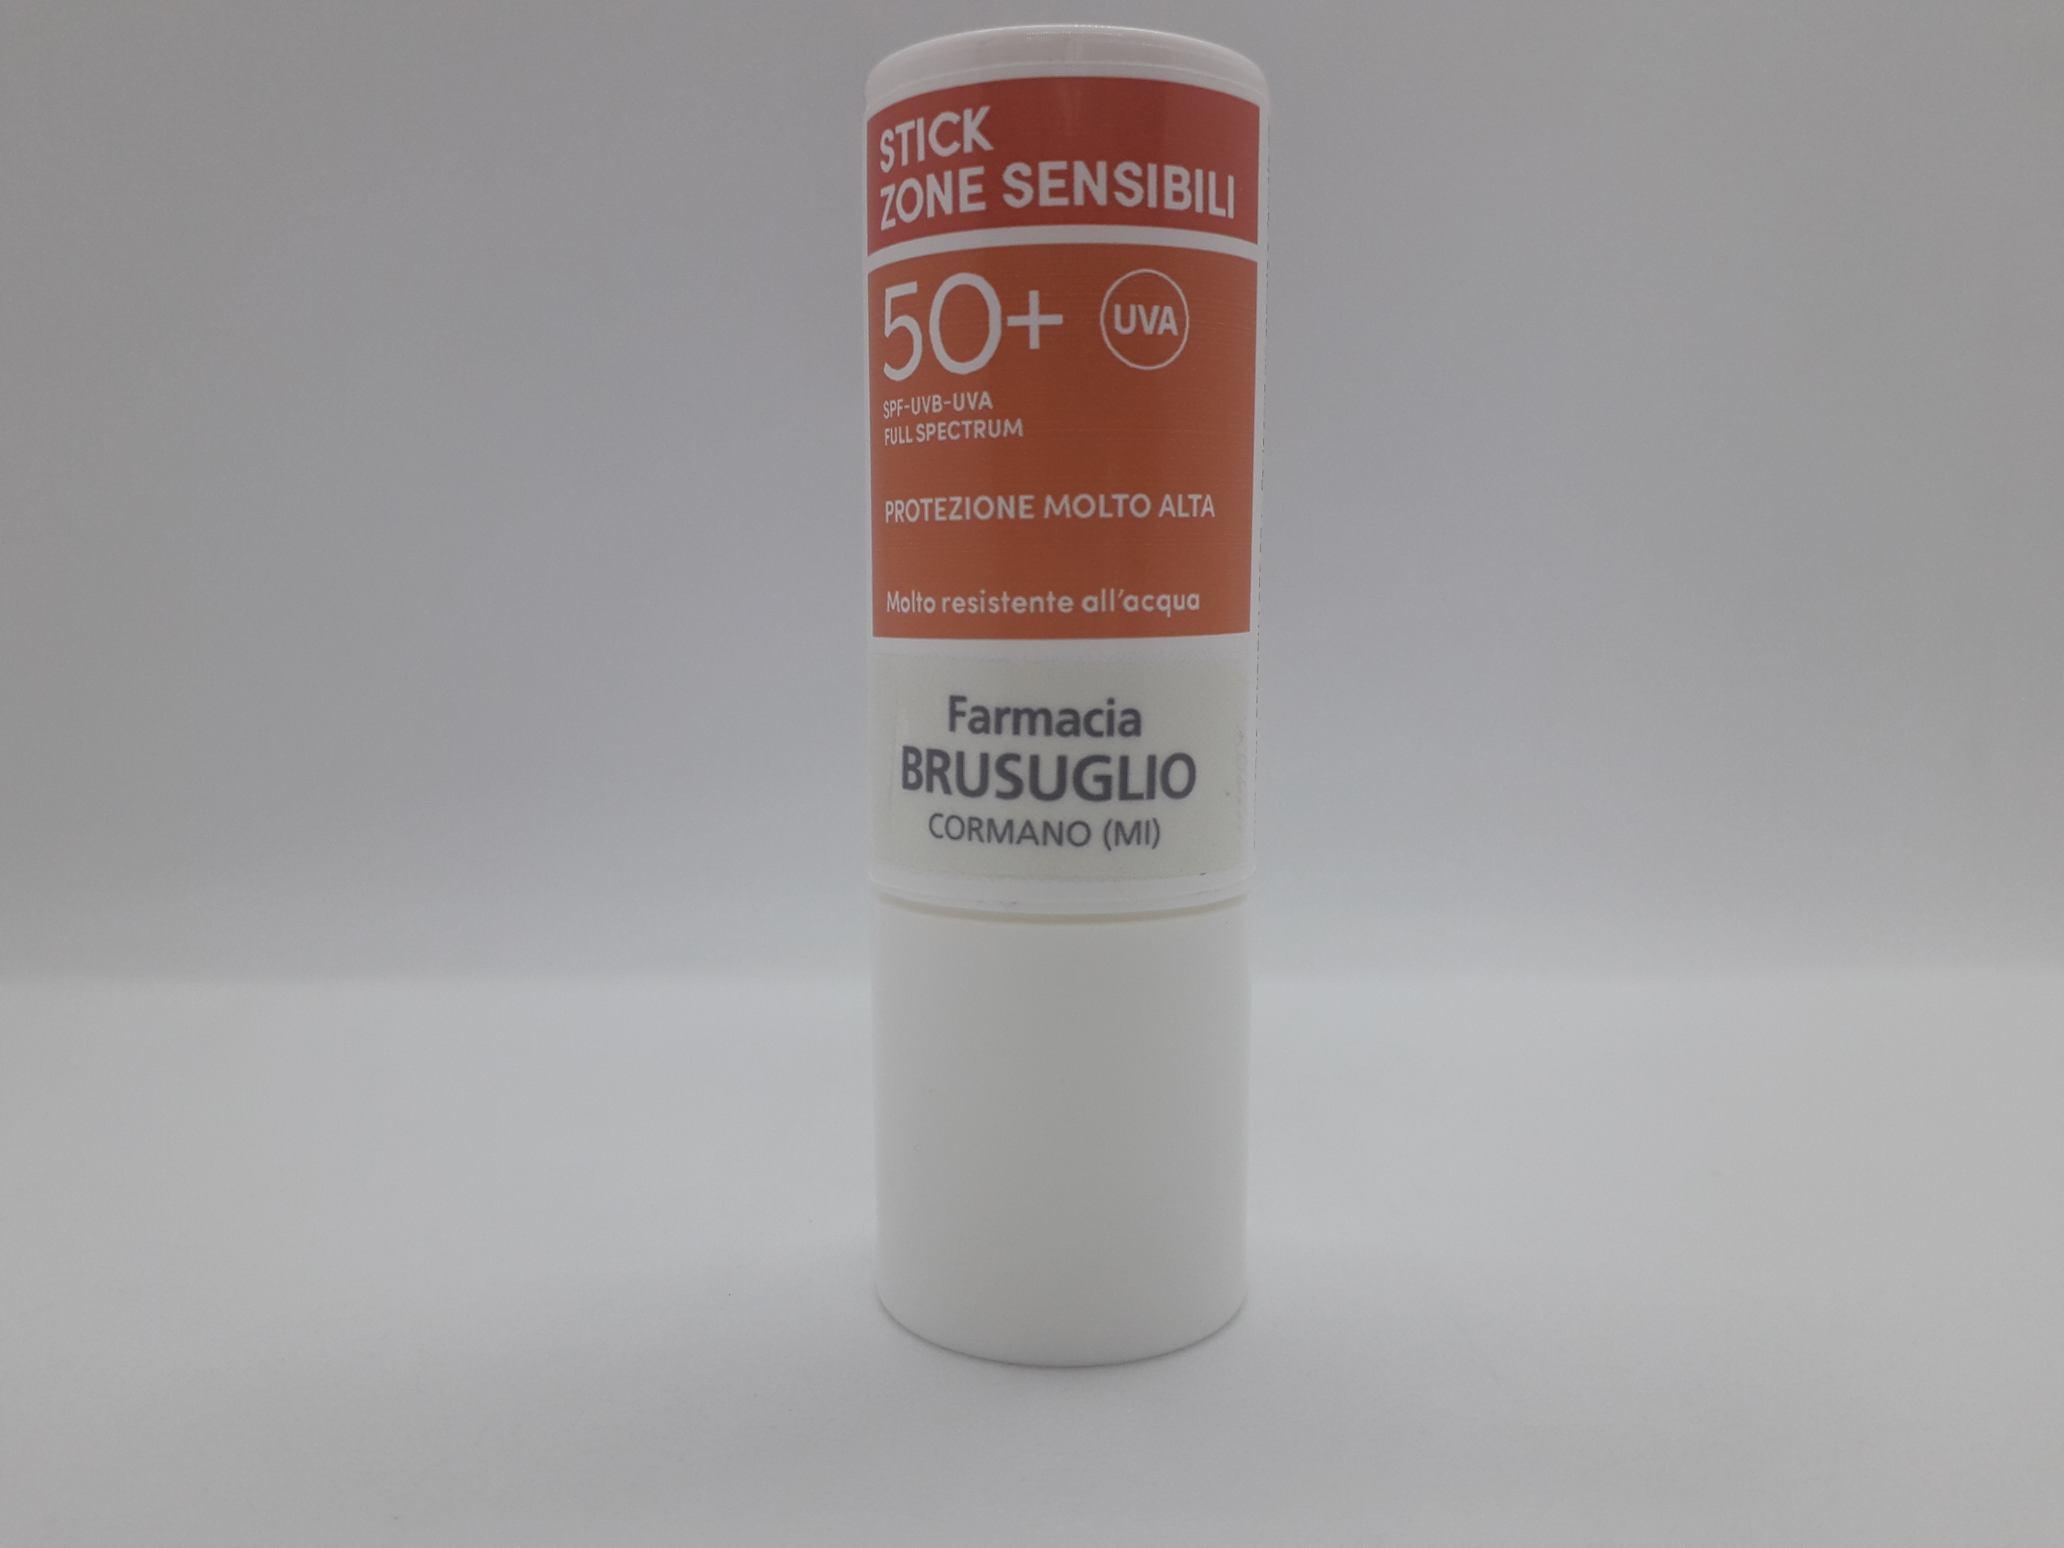 LFP SOL STICK ZONE SENS SPF 50+ - Farmaciaempatica.it